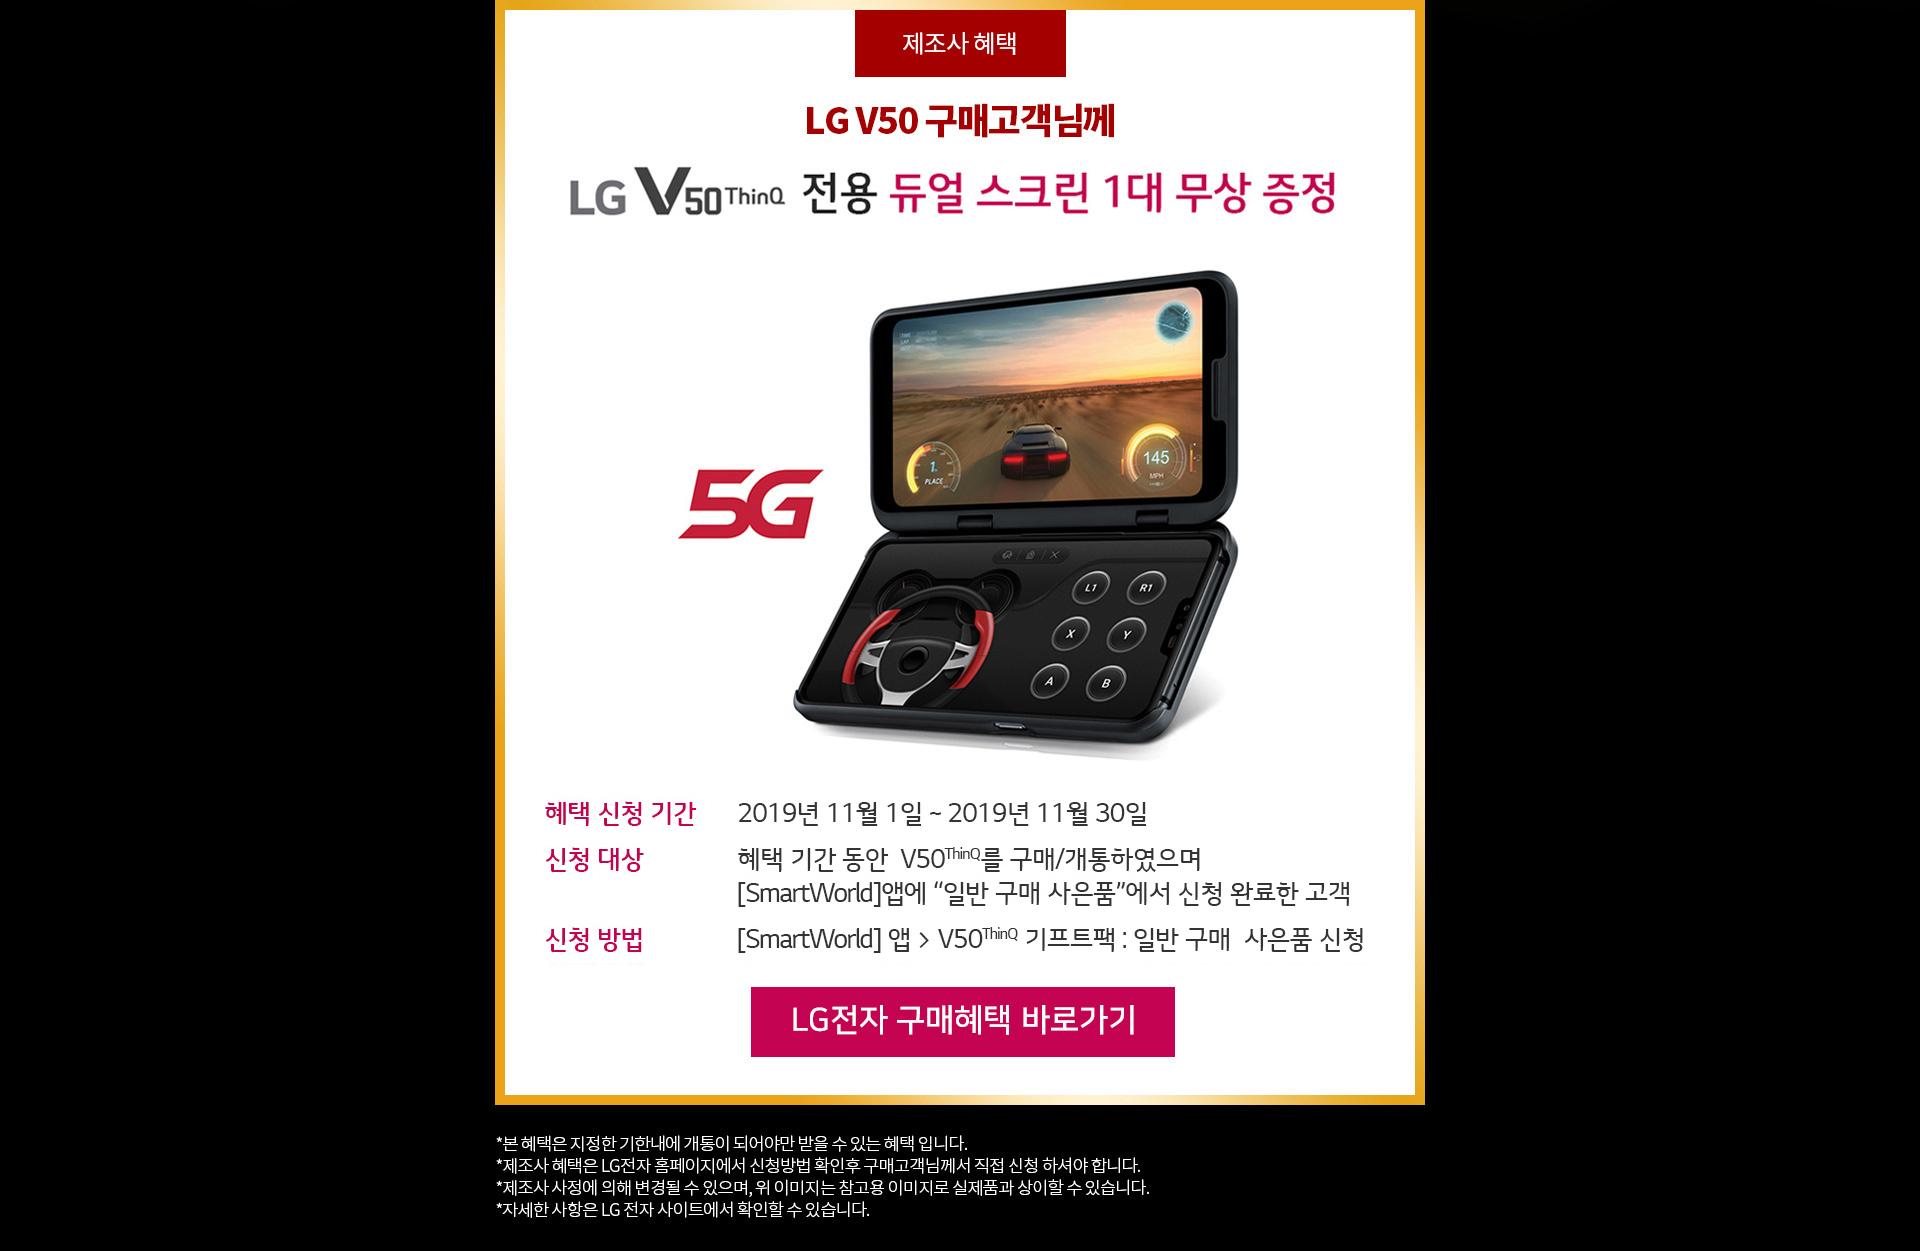 LGV50 엘지V50 V50 제조사 사은품 혜택